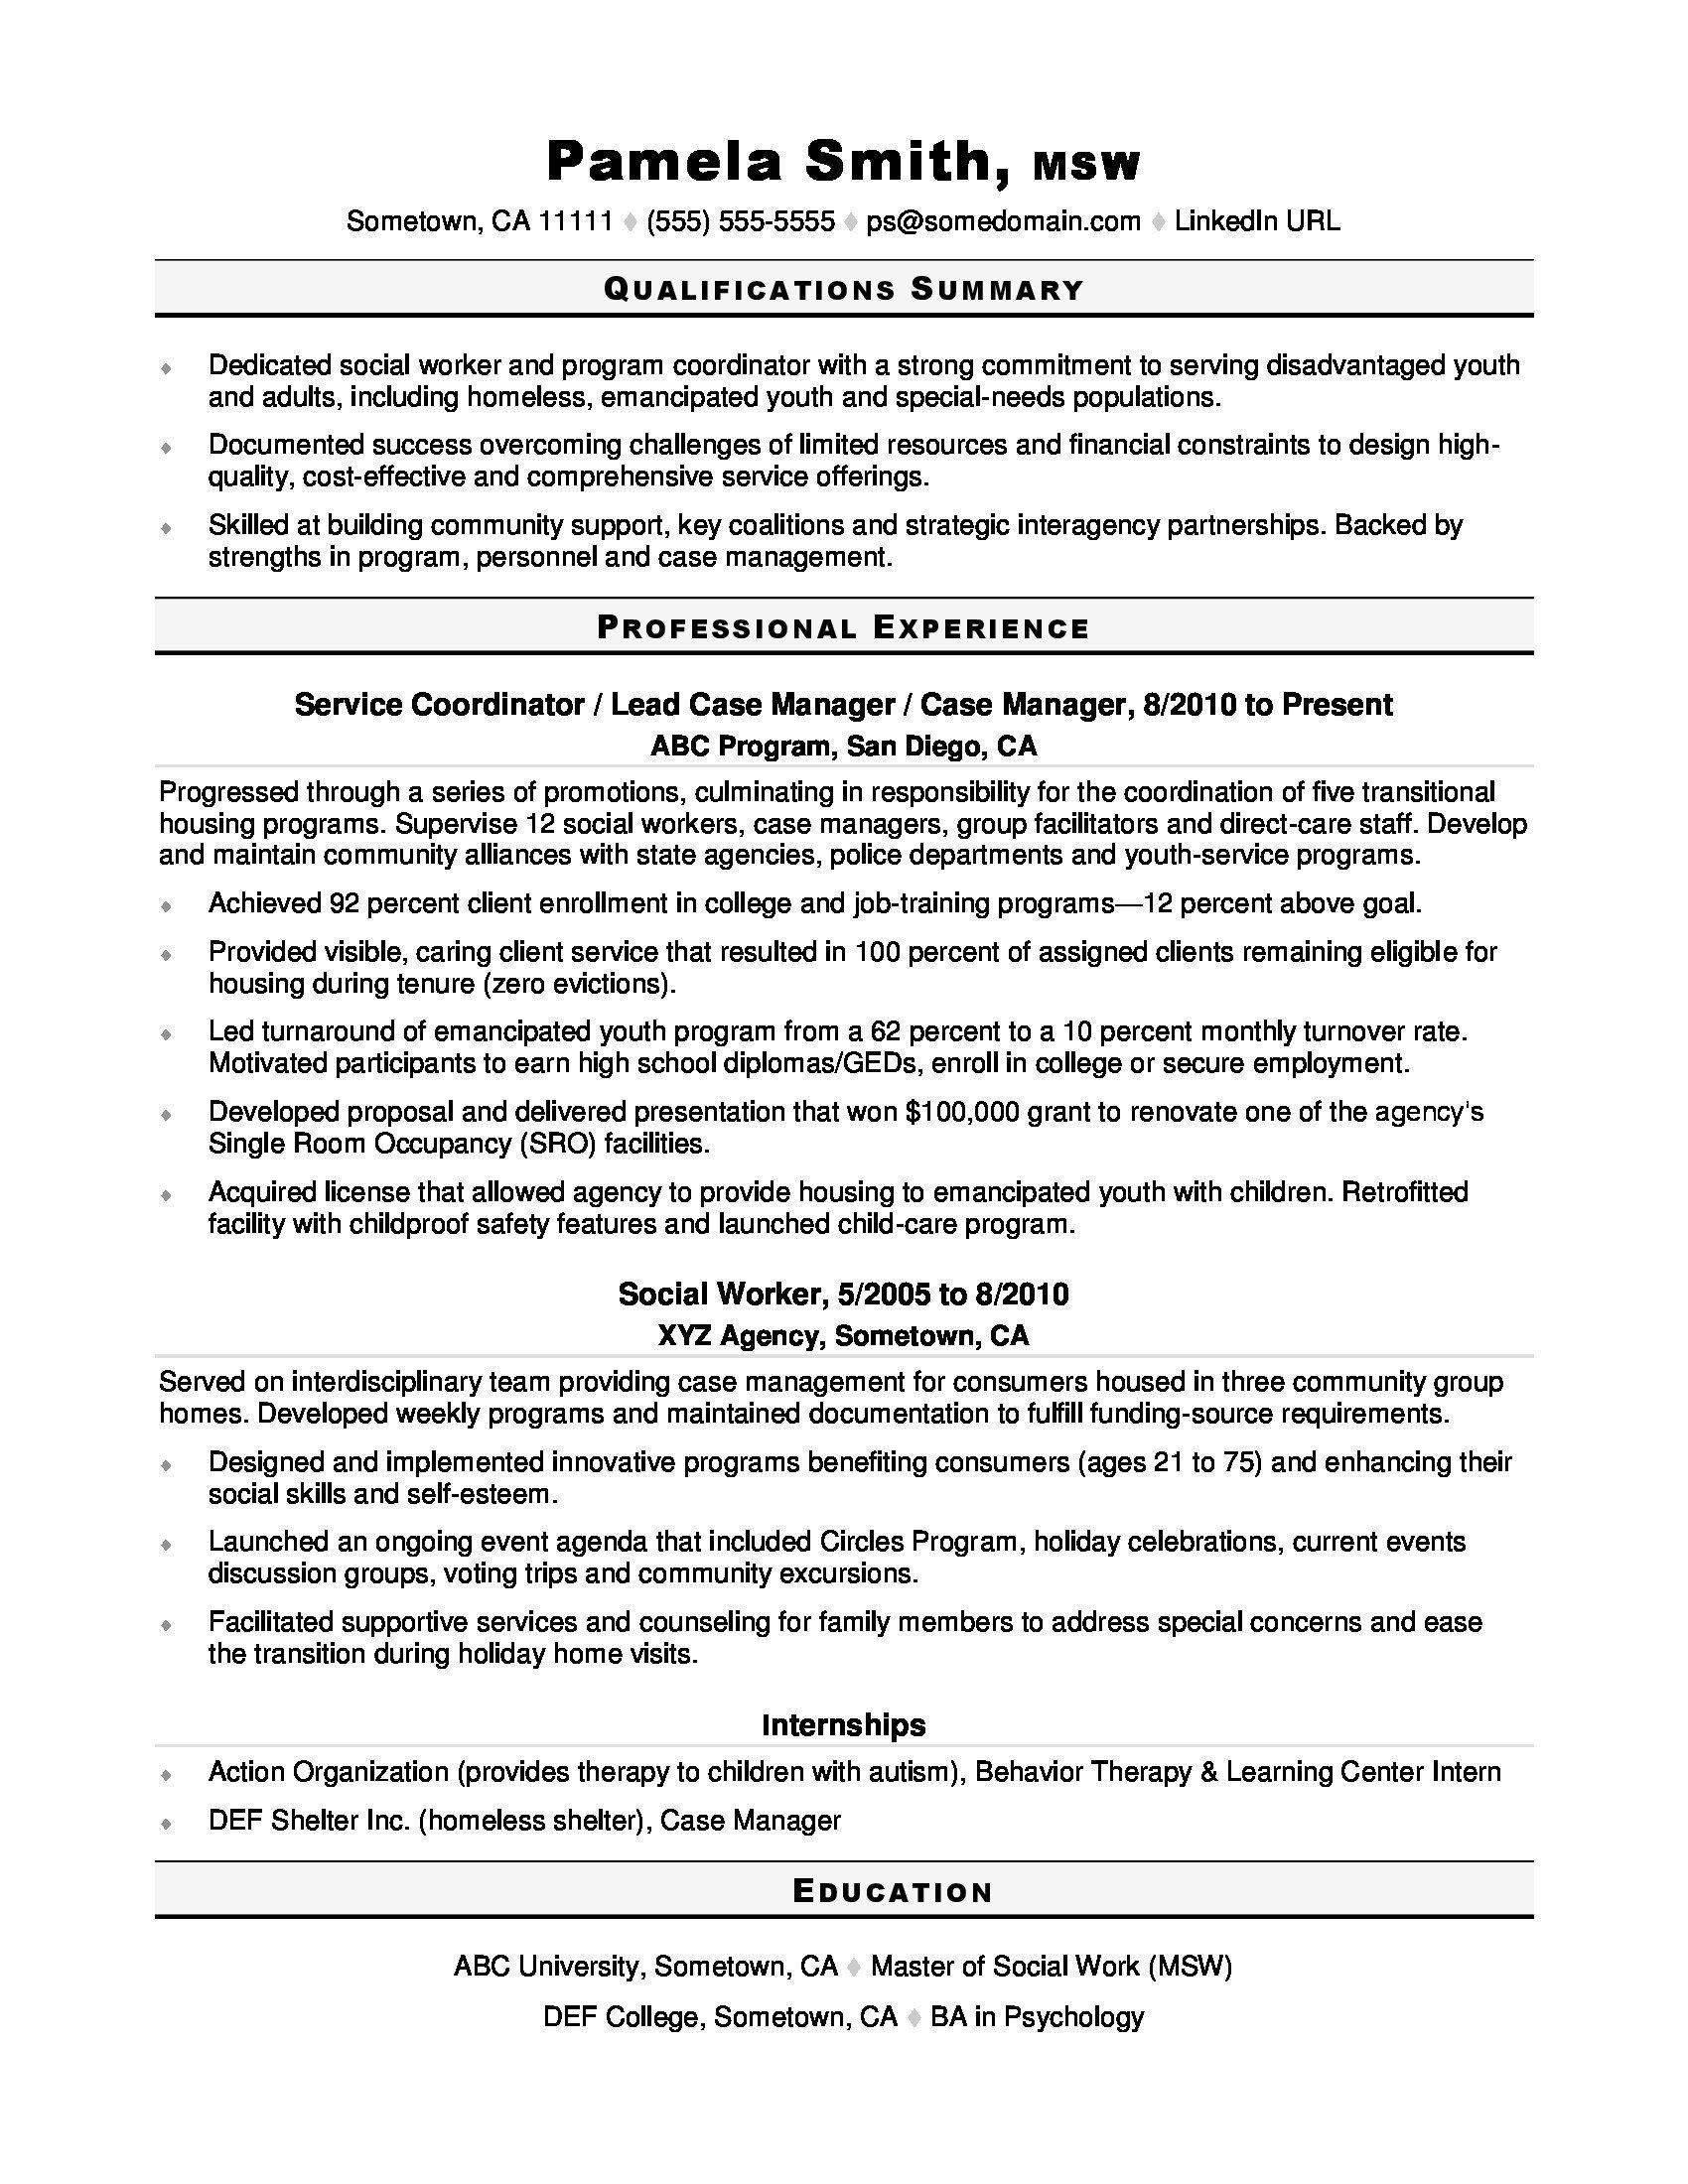 Social Worker Resume Templates social Worker Resume Sample